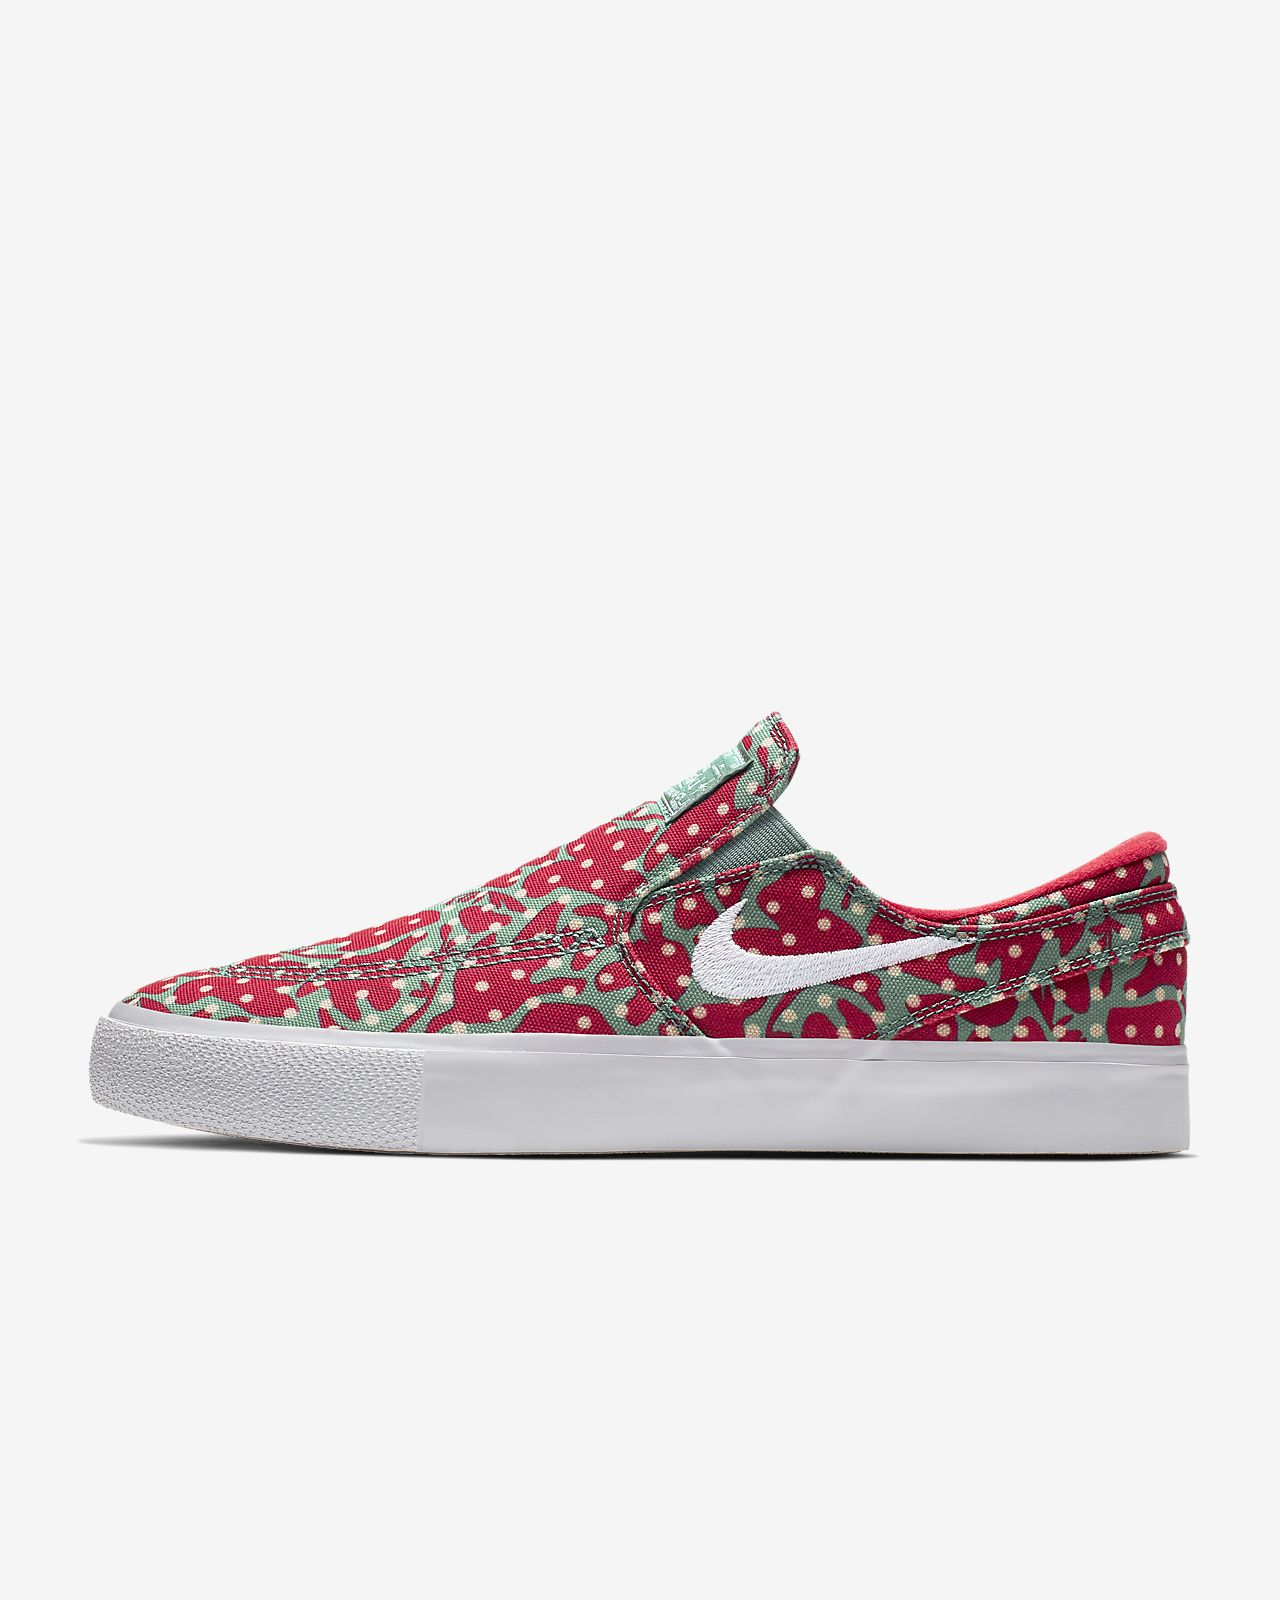 Nike SB Zoom Stefan Janoski Slip RM Canvas Skate Shoe